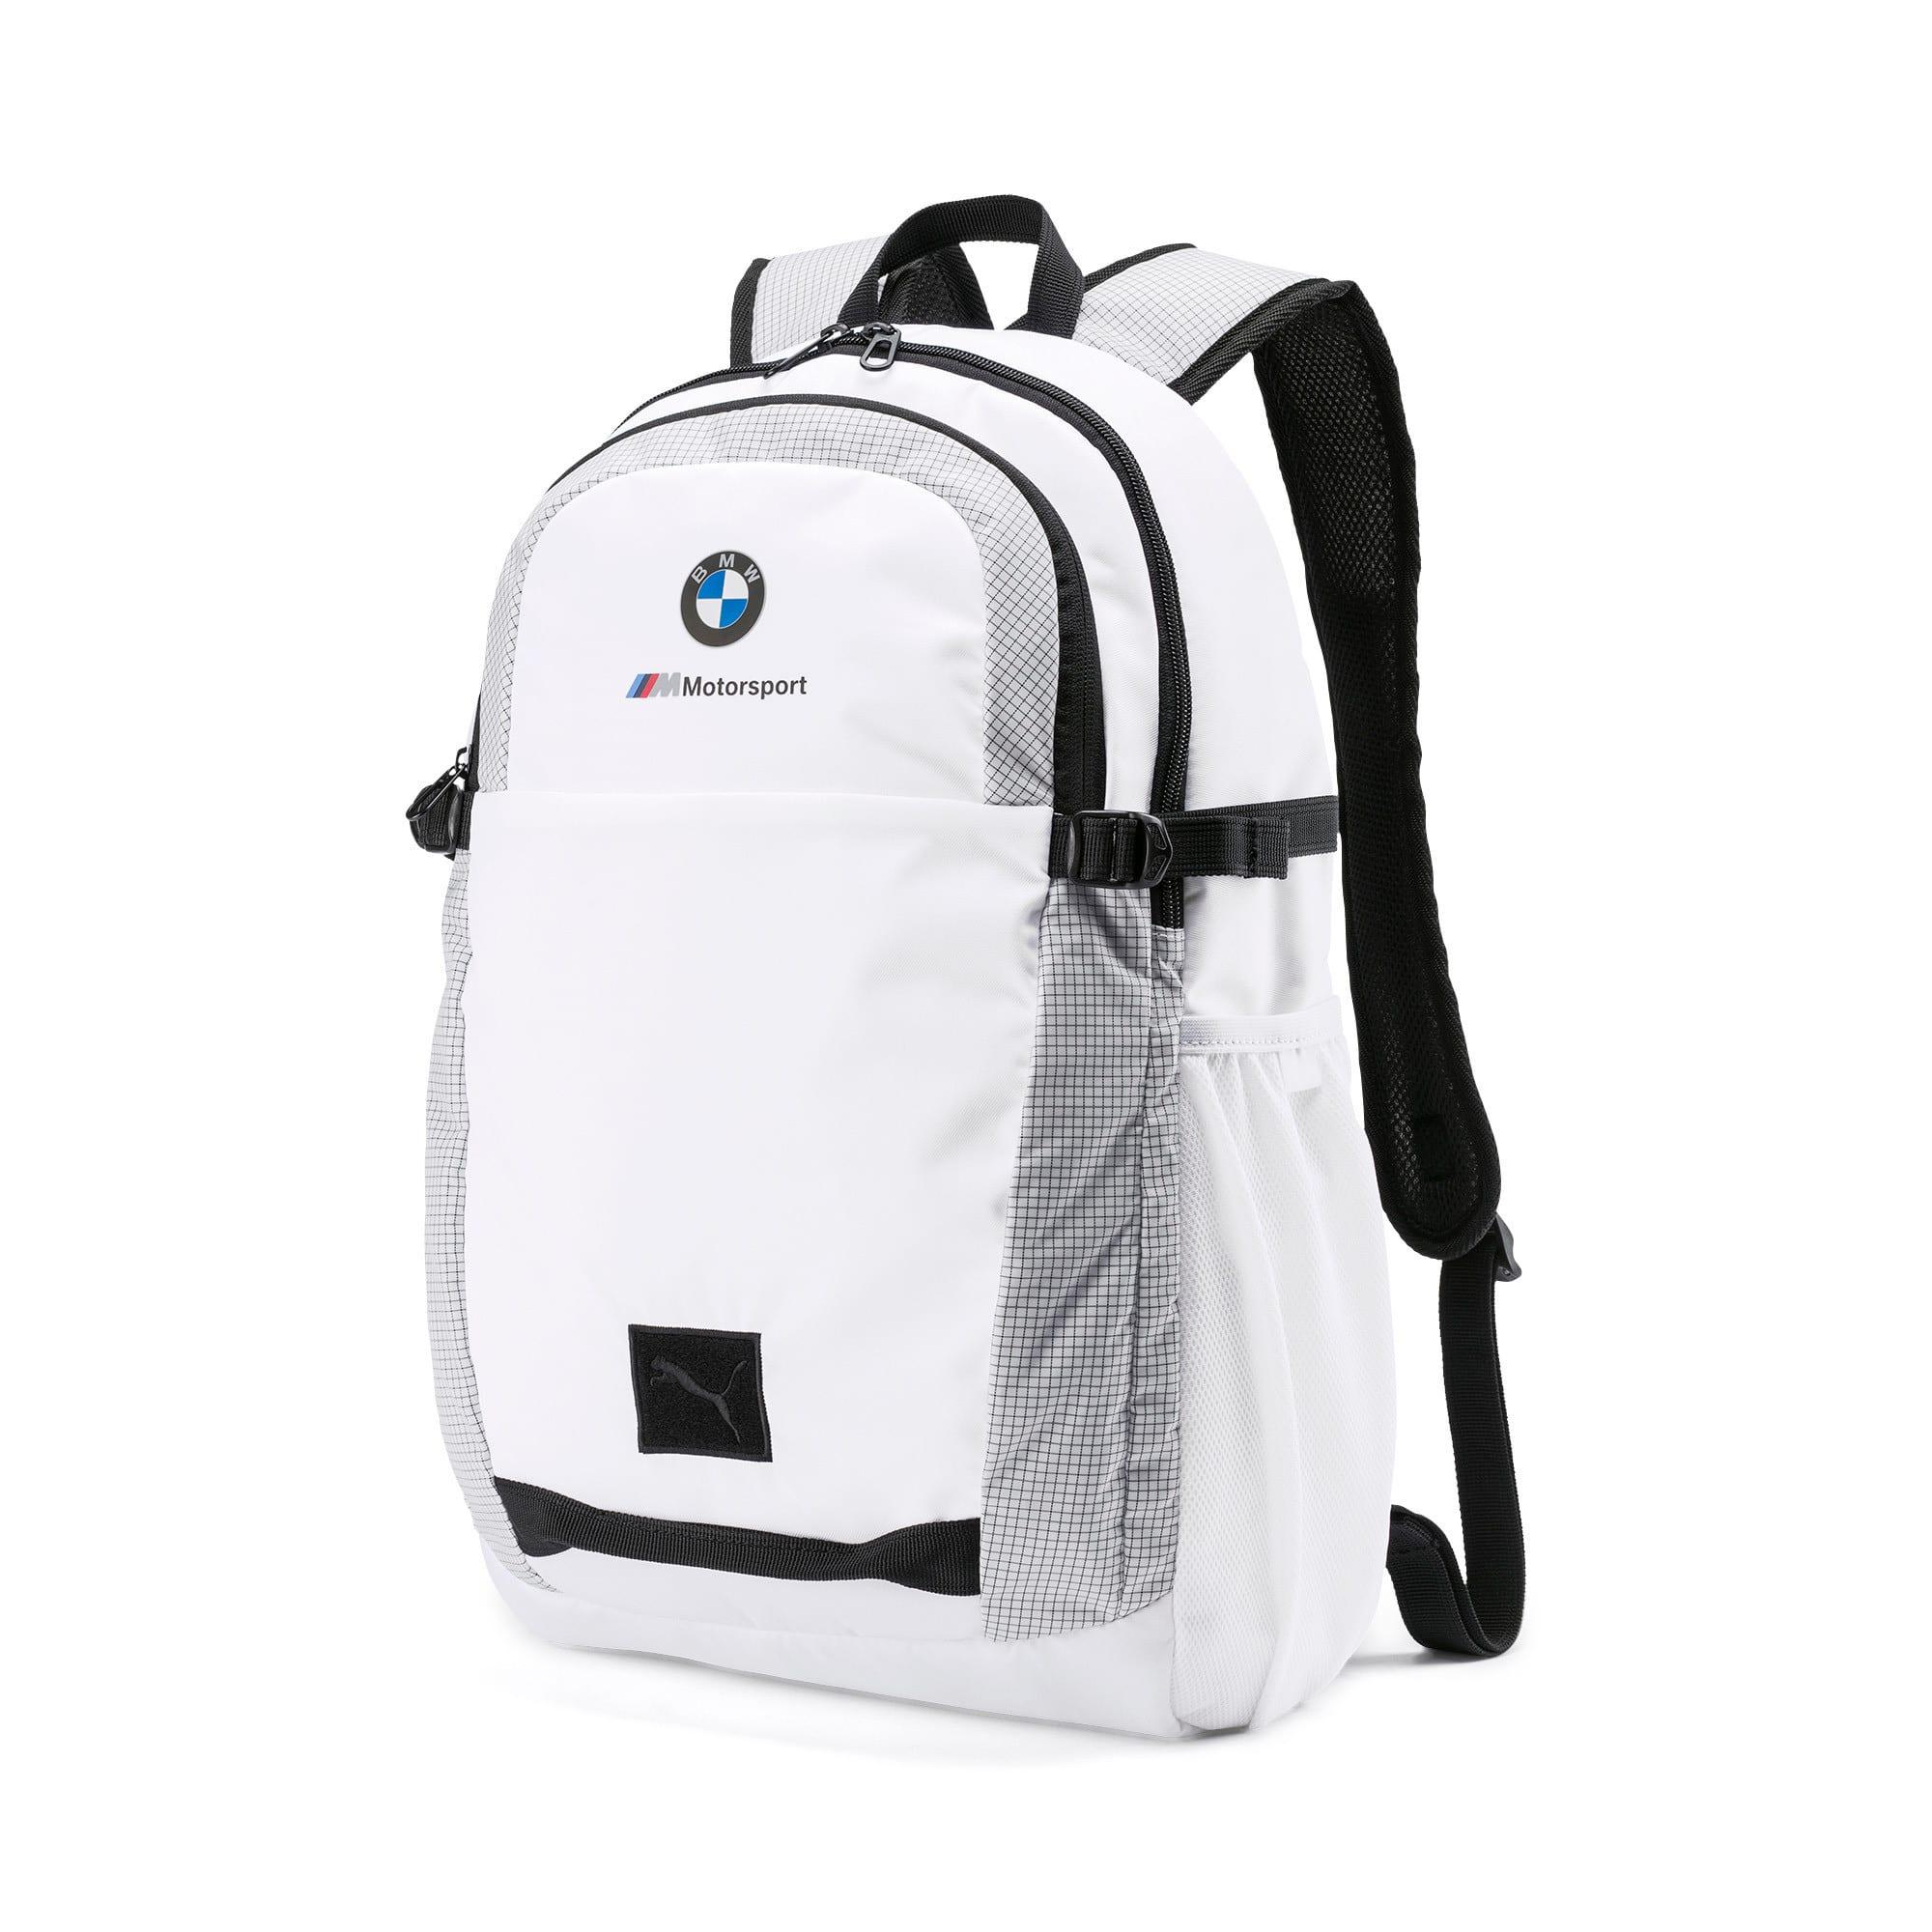 Thumbnail 1 of BMW M Motorsport Backpack, Puma White, medium